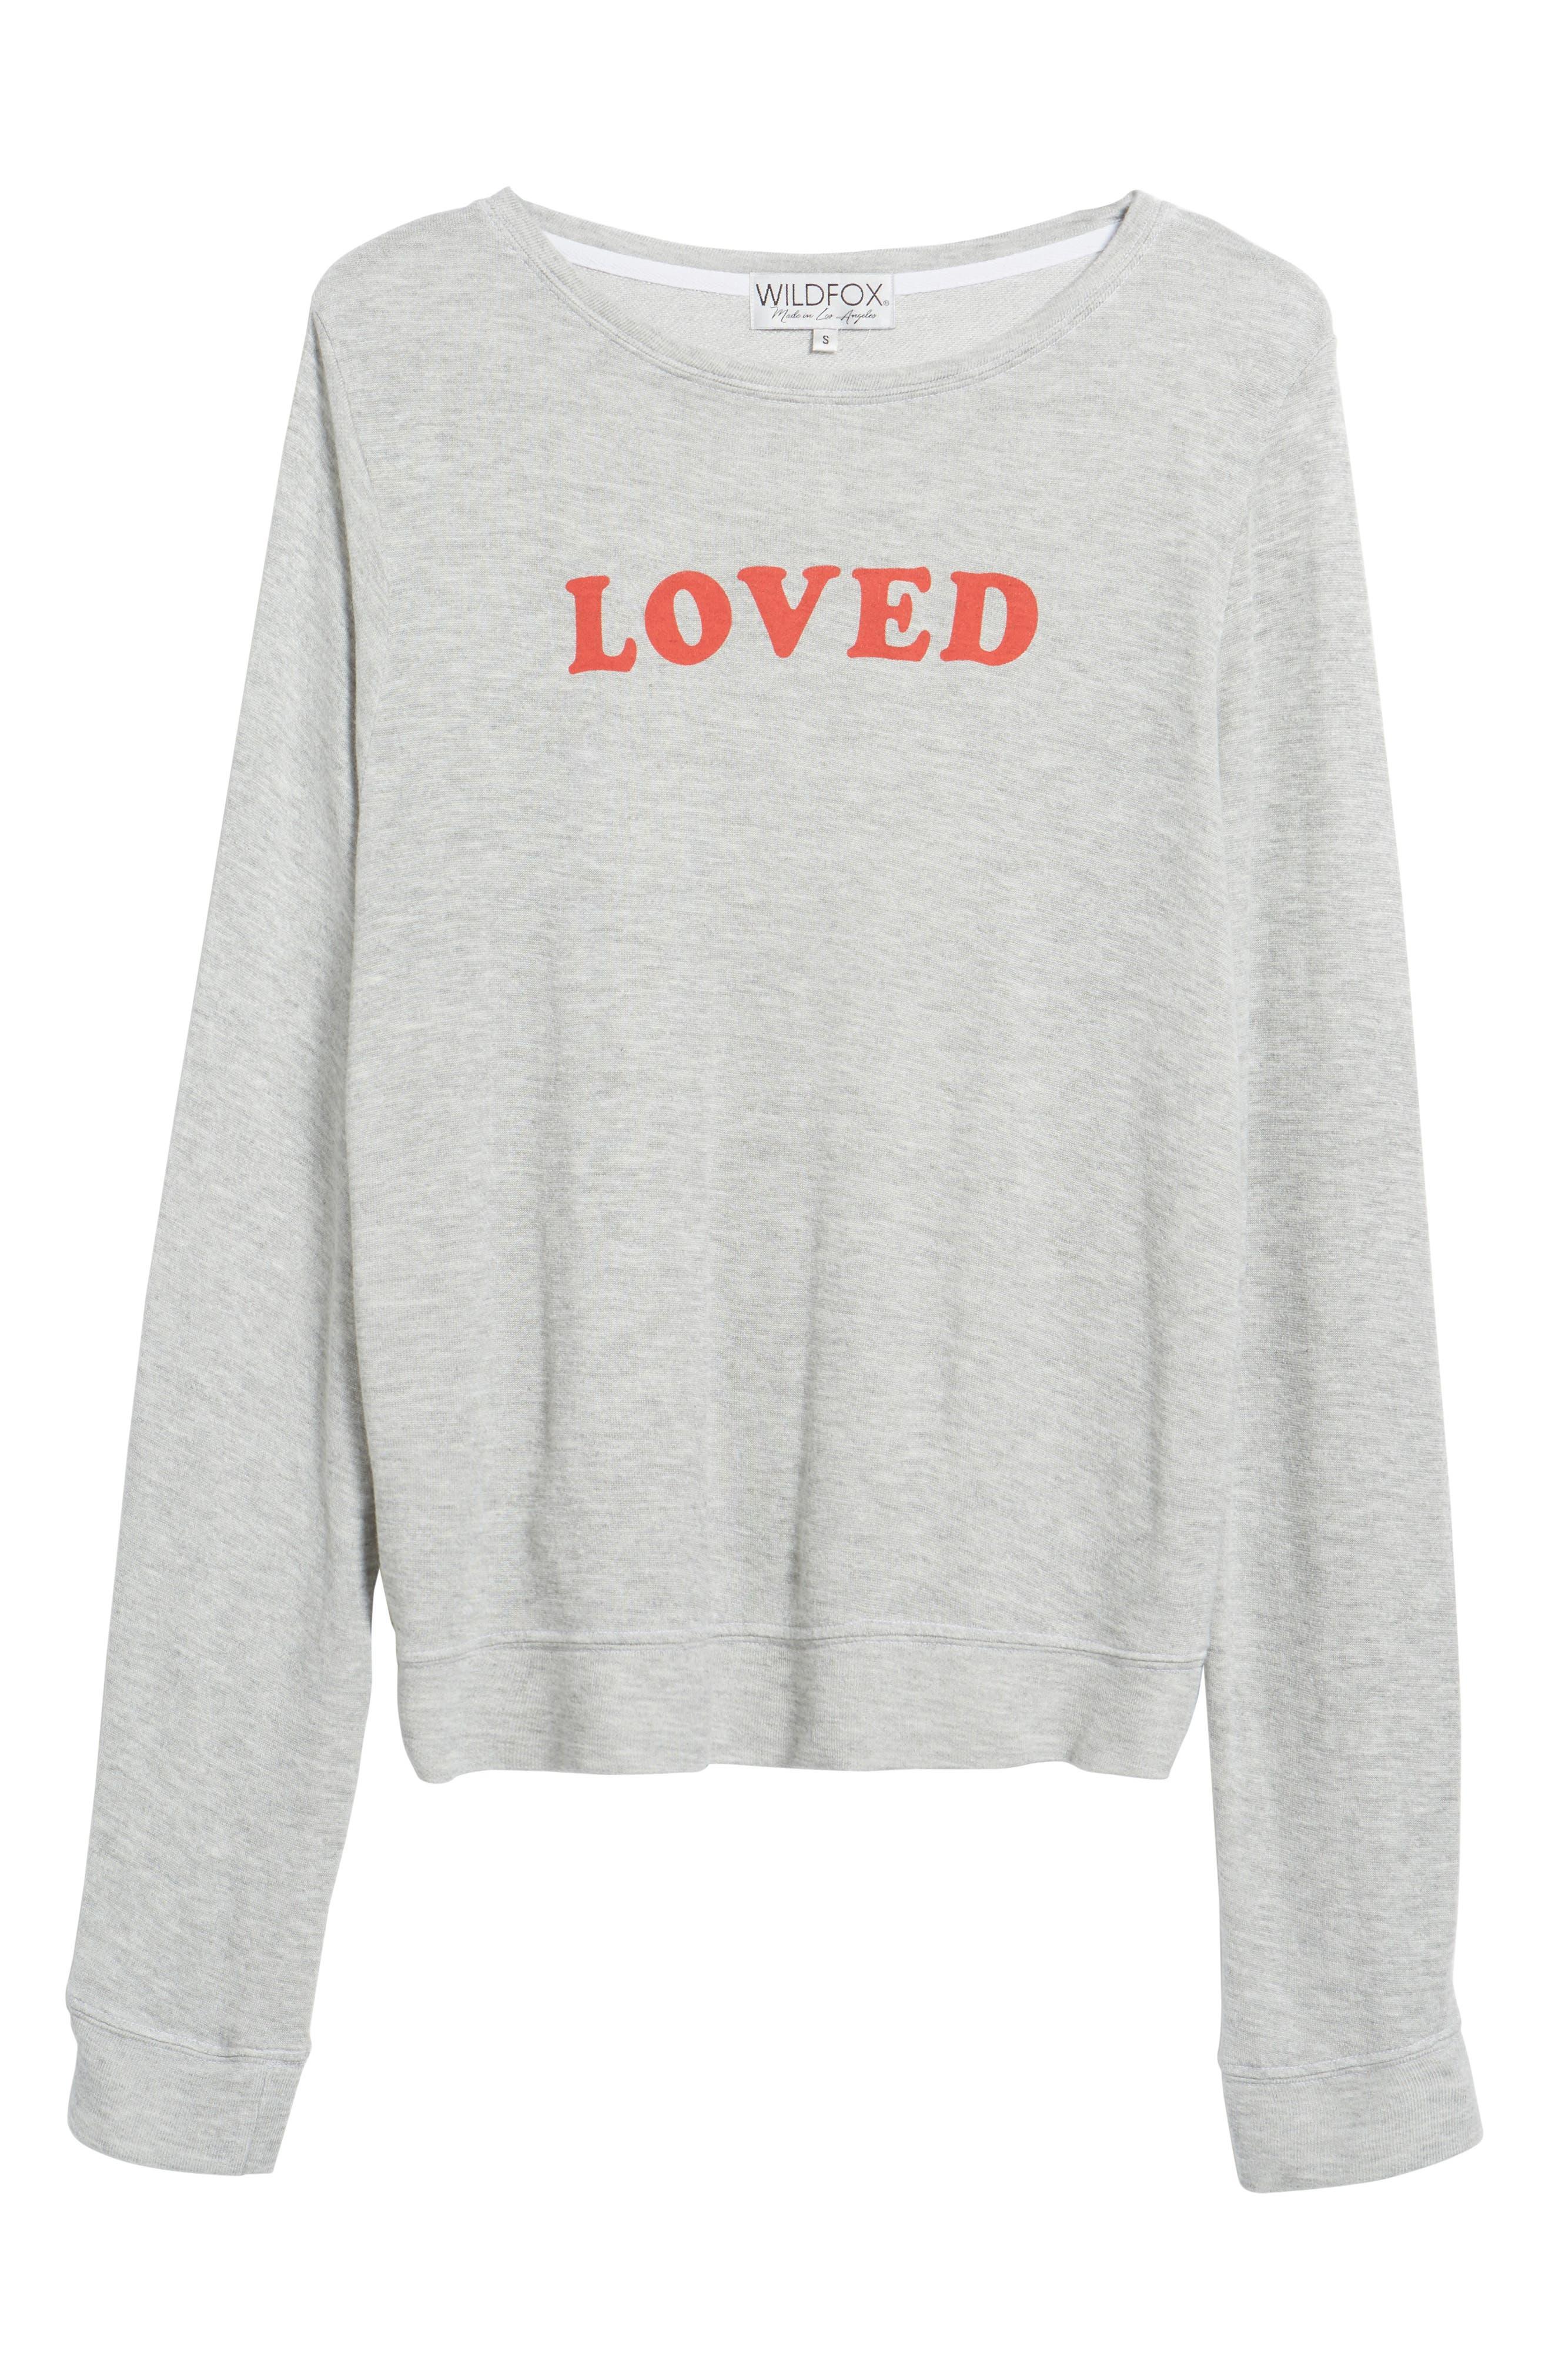 Loved Sweatshirt,                             Alternate thumbnail 6, color,                             020